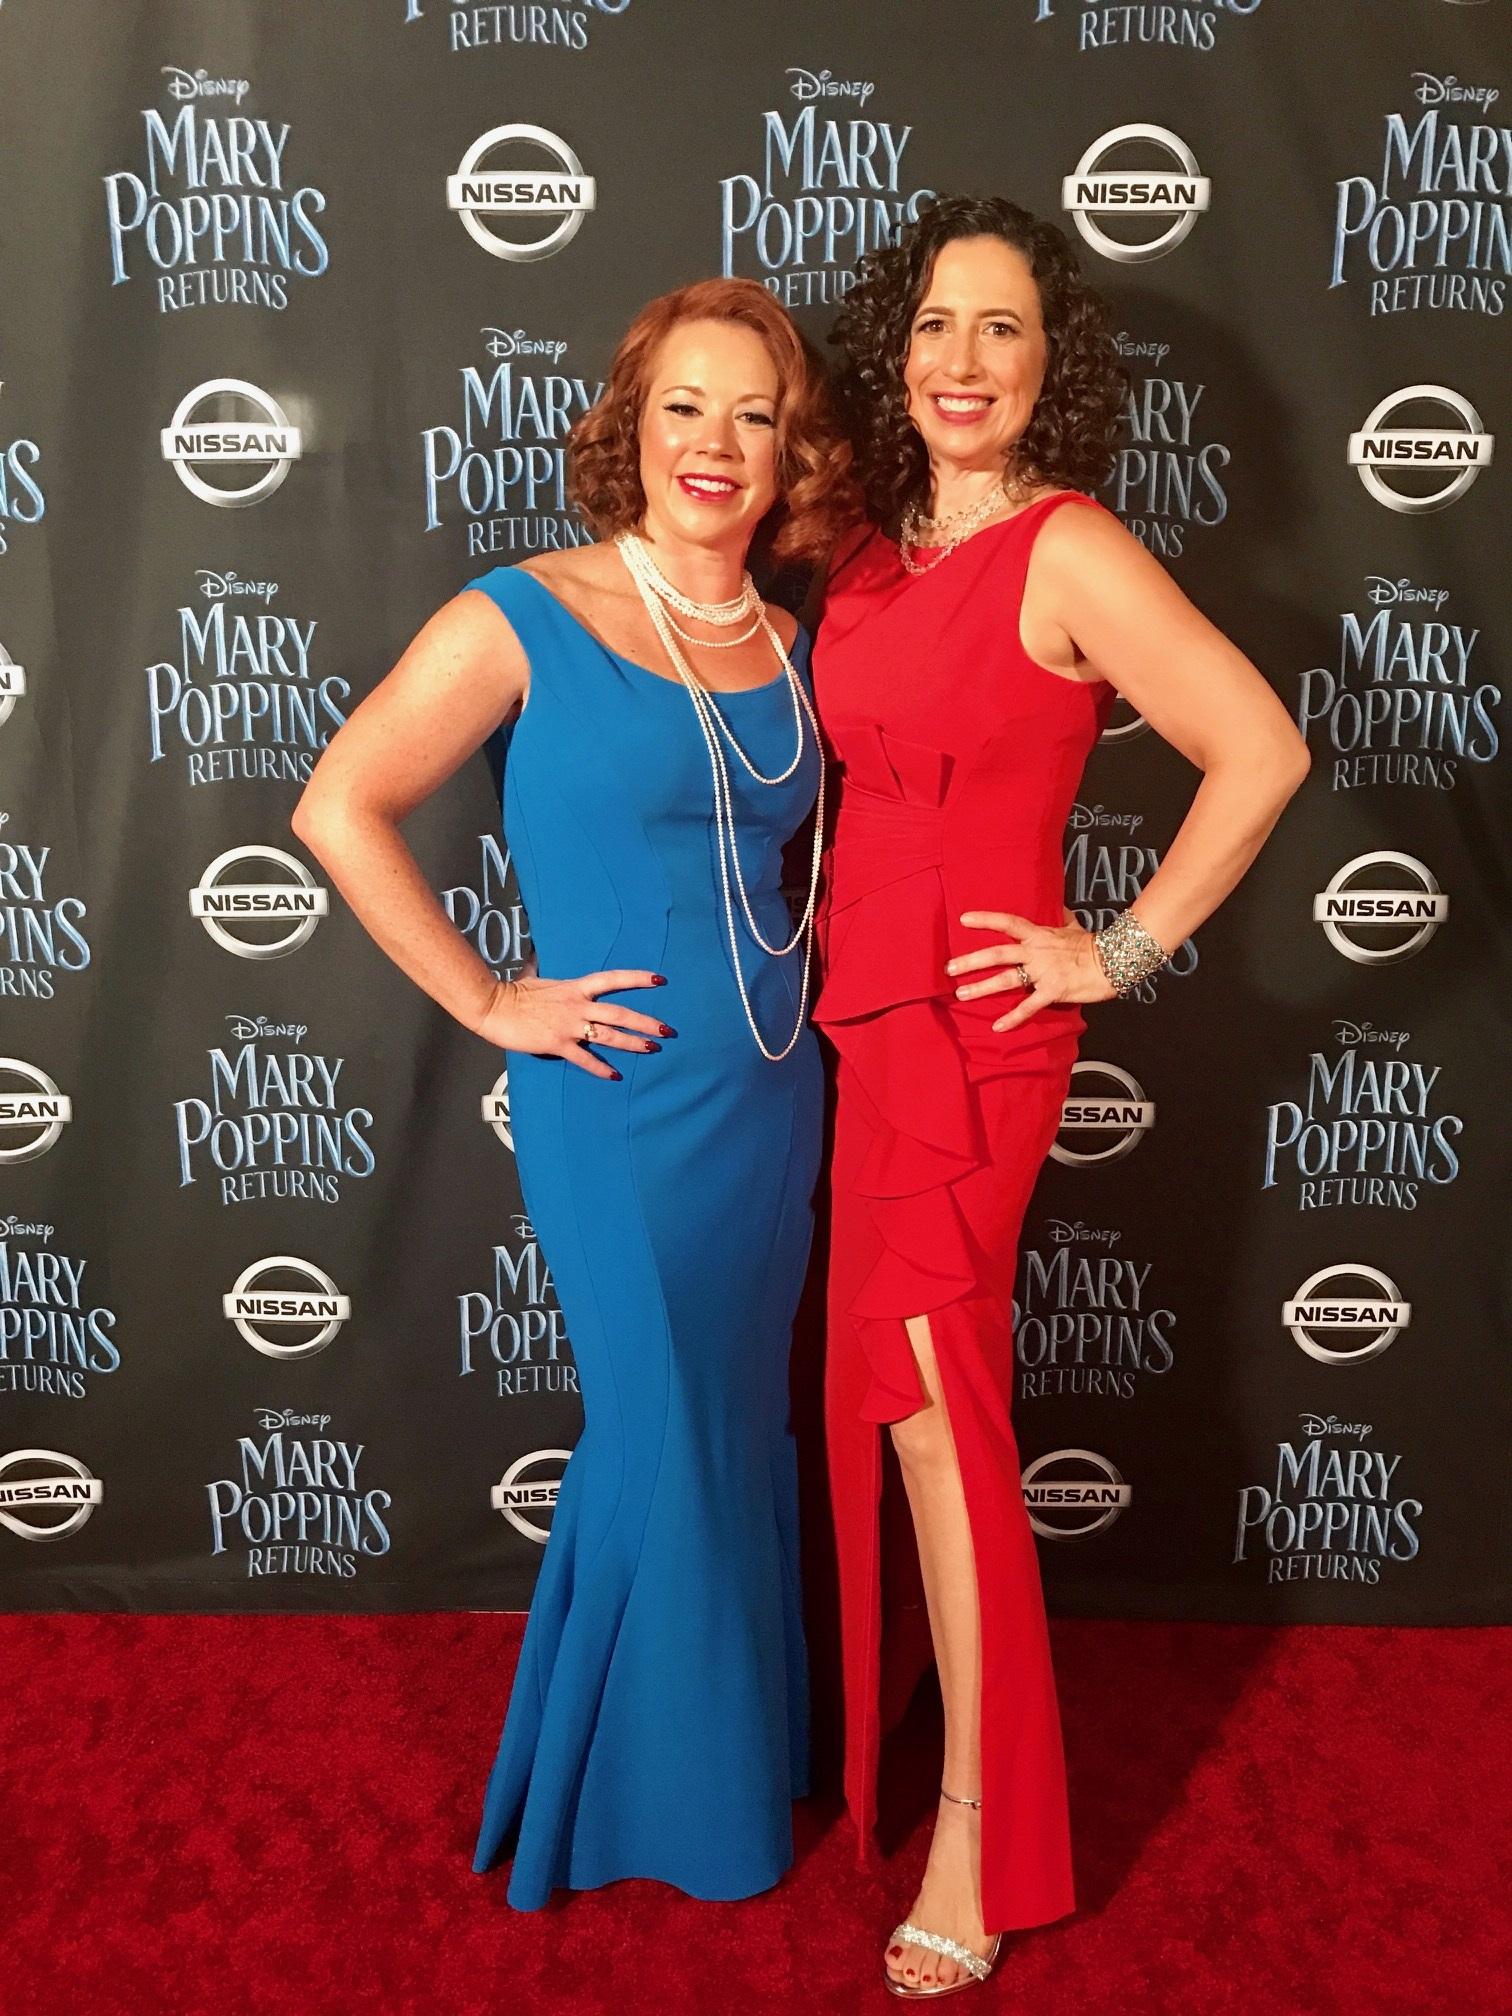 Wendy and Kristin red carpet.jpg